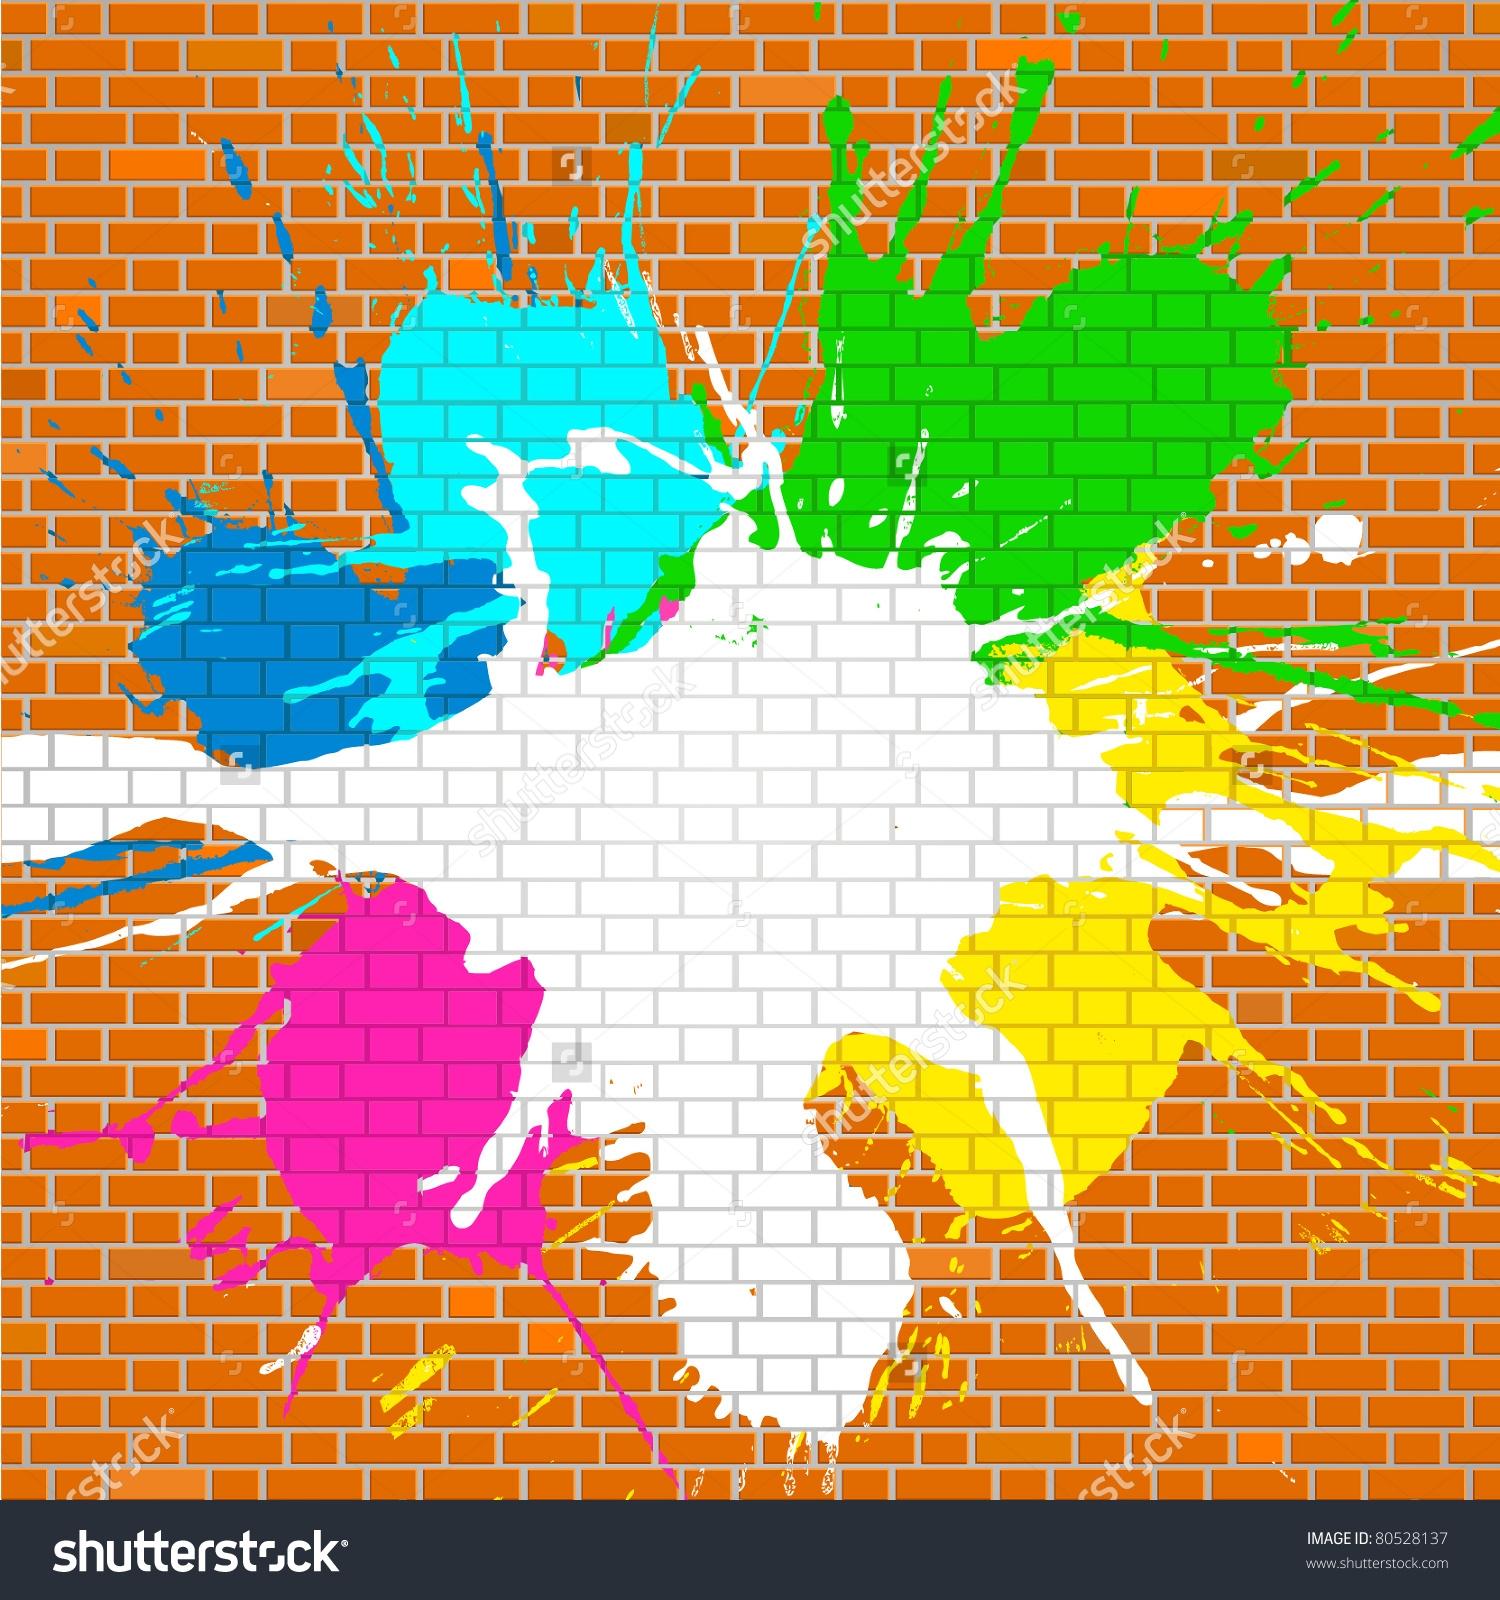 Graffiti clipart Graffiti Brick Wall Clipart  Landscape : Brick Elegant